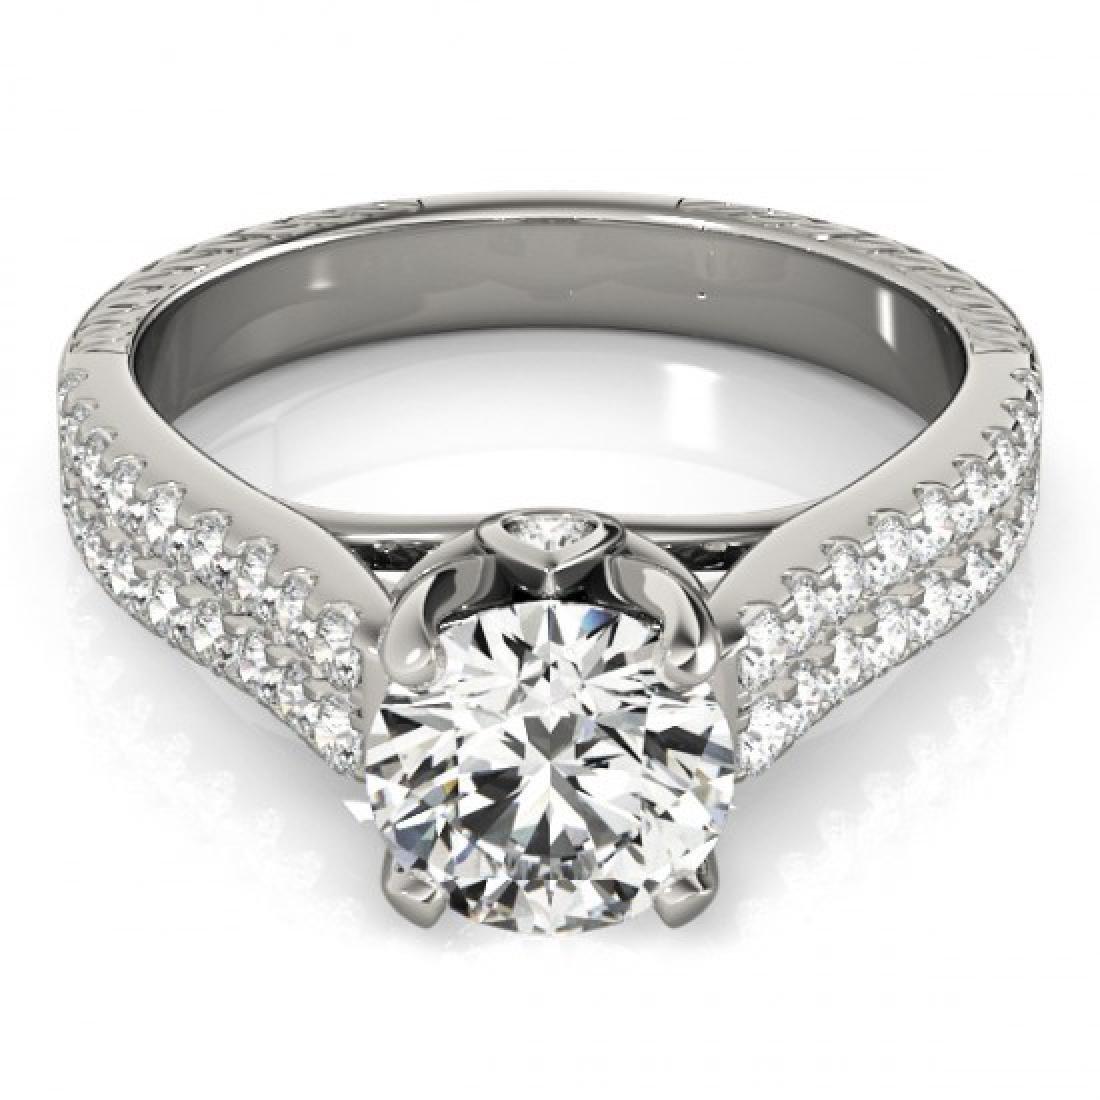 1.36 CTW Certified VS/SI Diamond Pave Ring 14K White